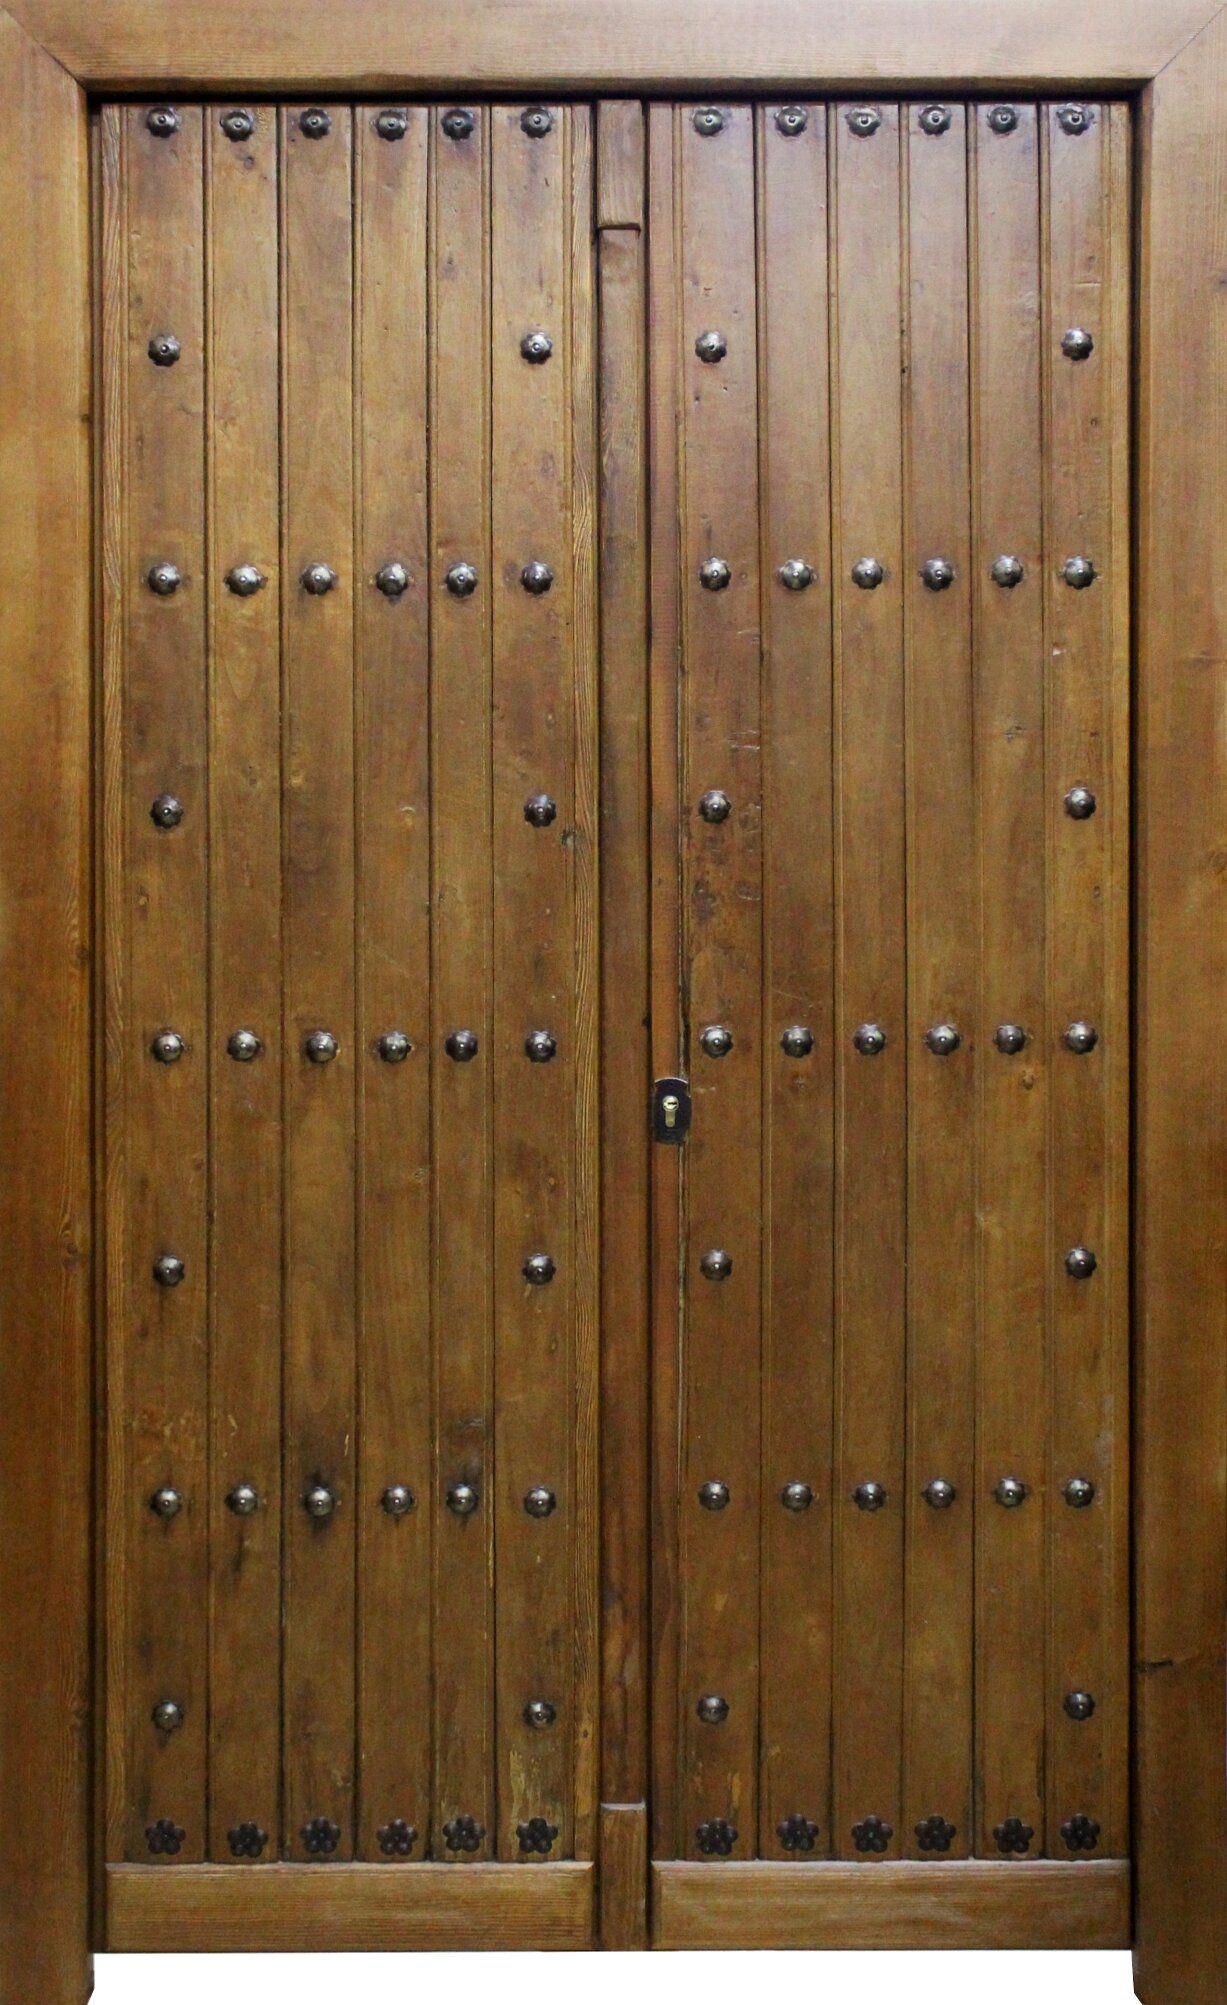 Puertas Antiguas Exterior E Interior En Madera 2020 Puertas Madera Antiguas Puertas De Madera Puertas De Madera Rusticas